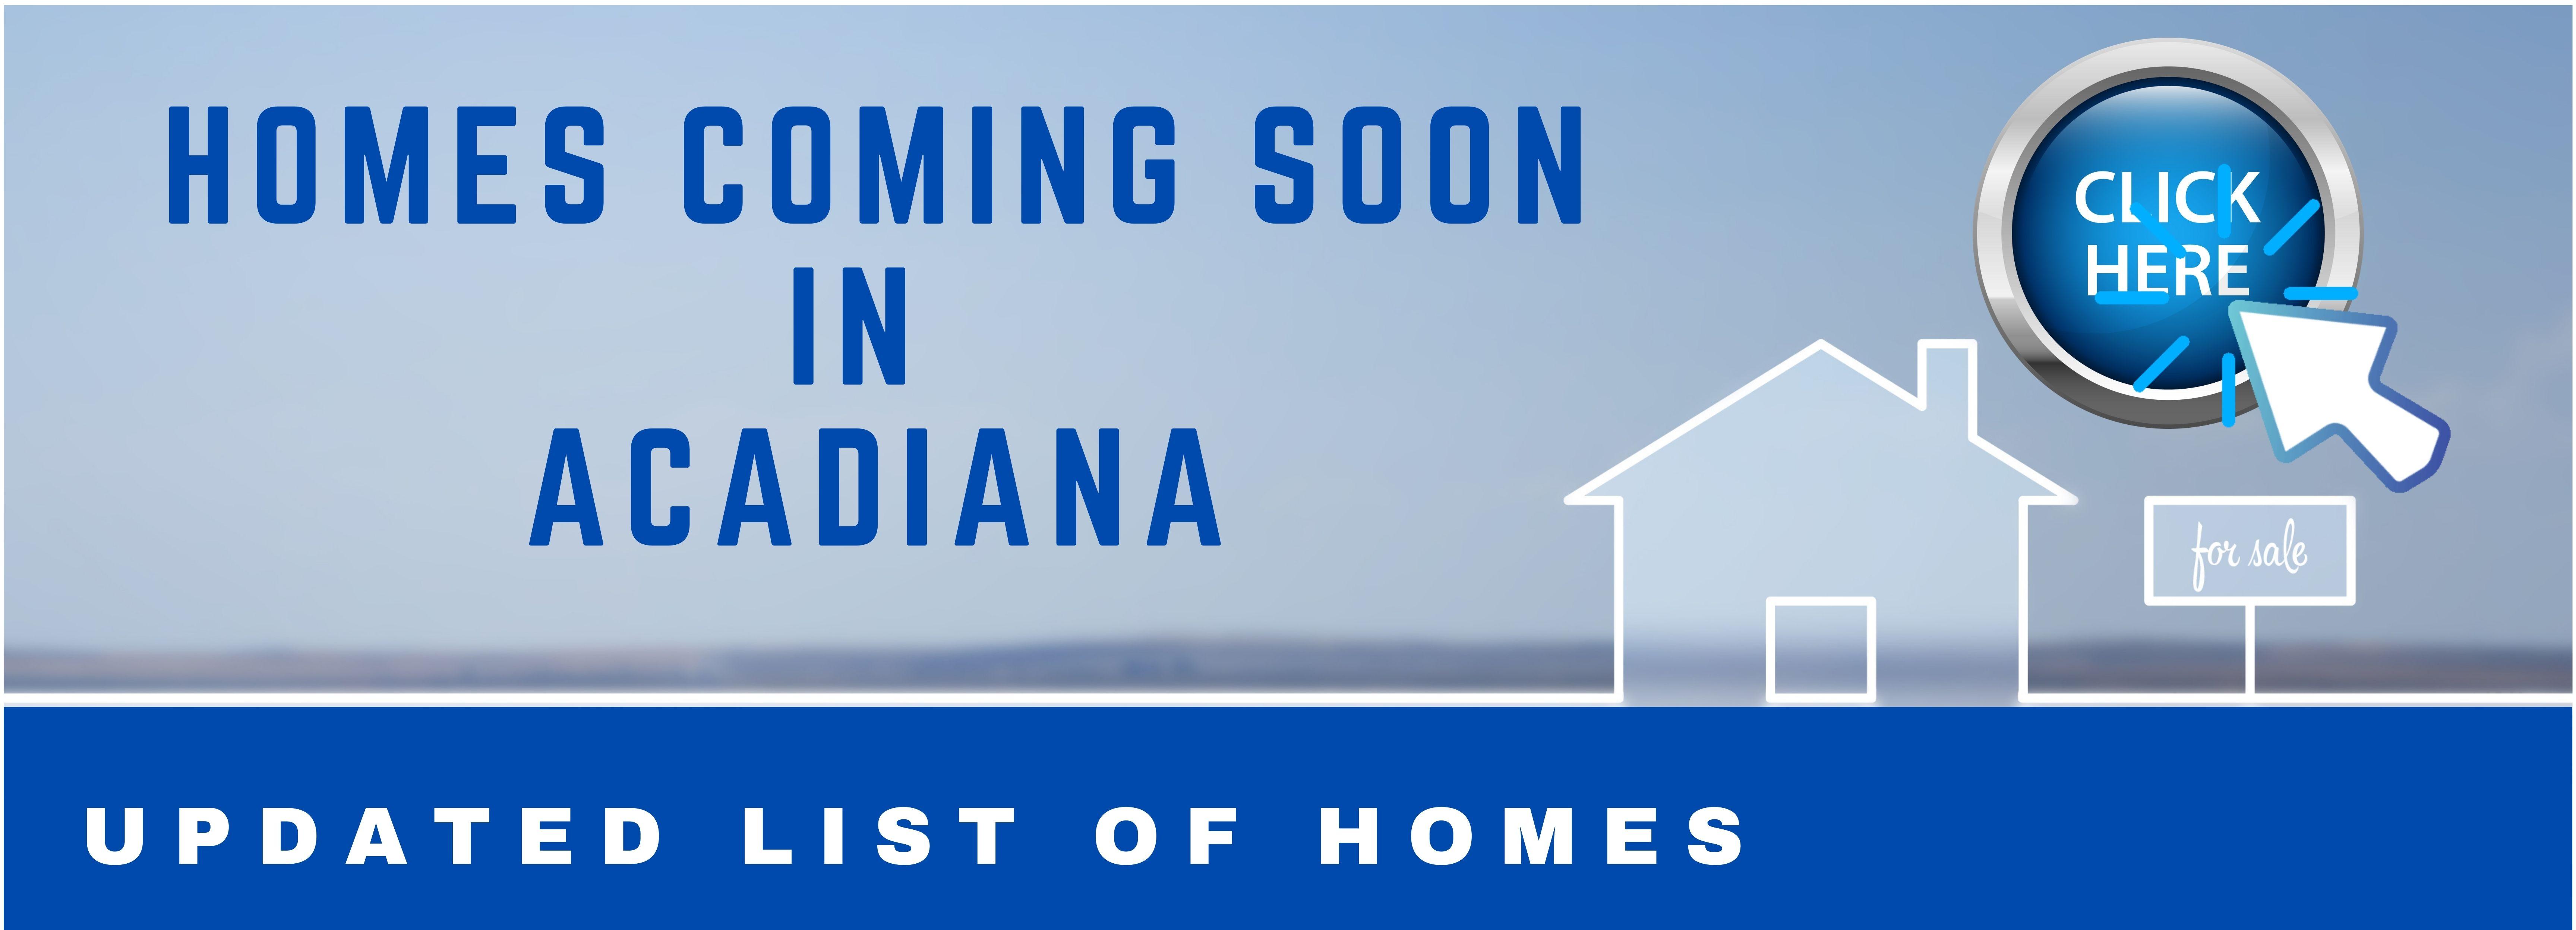 homes coming soon in acadiana